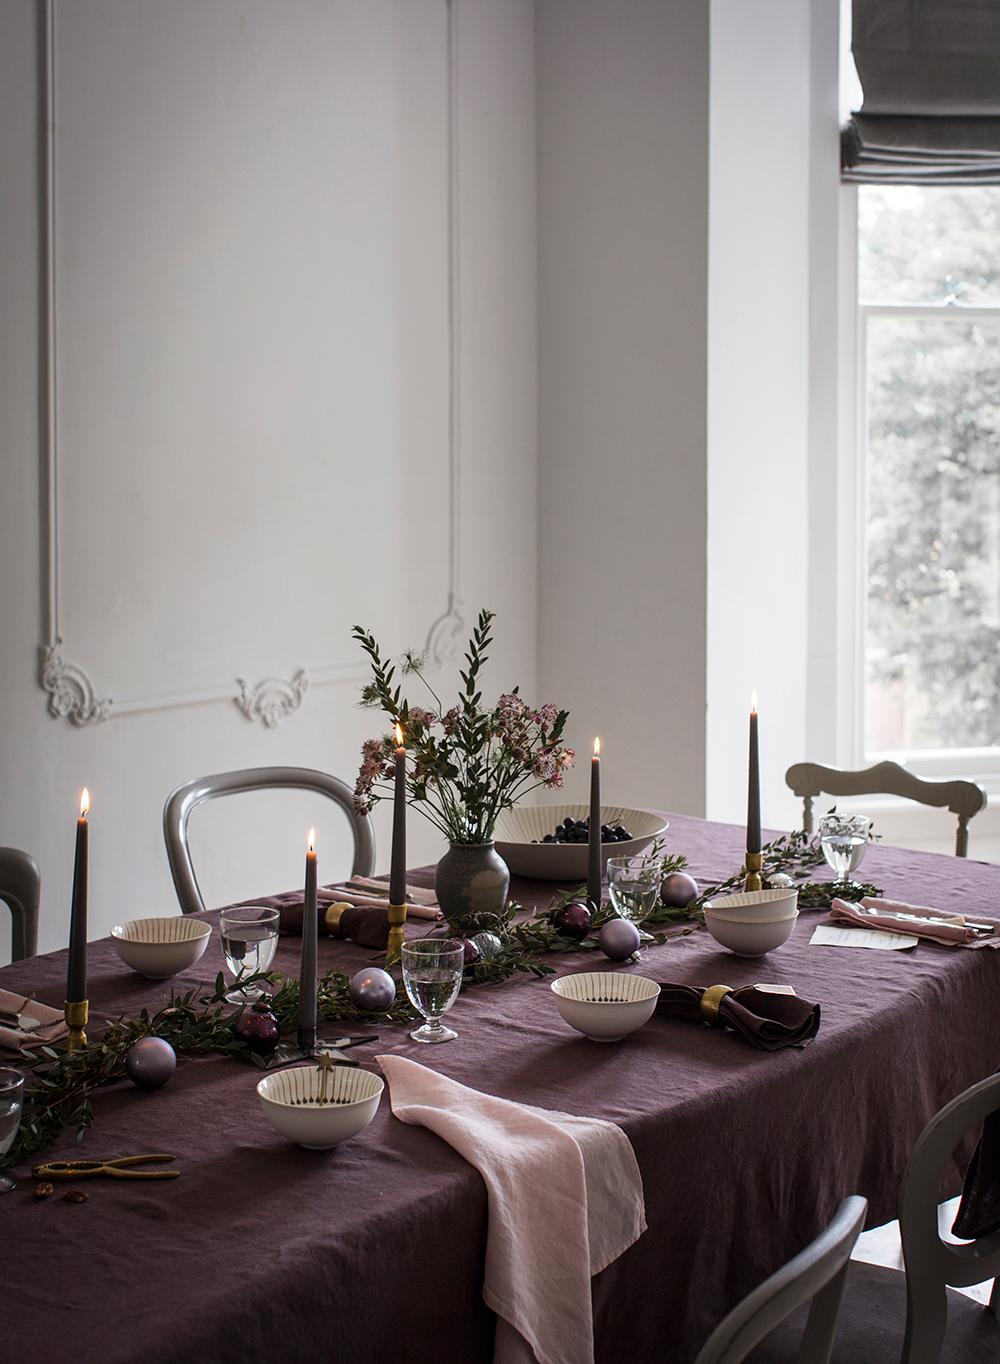 THE-LINEN-WORKS-I-Table-Linen-Aubergine-Tablecloth;-Rose-Napkin.jpg